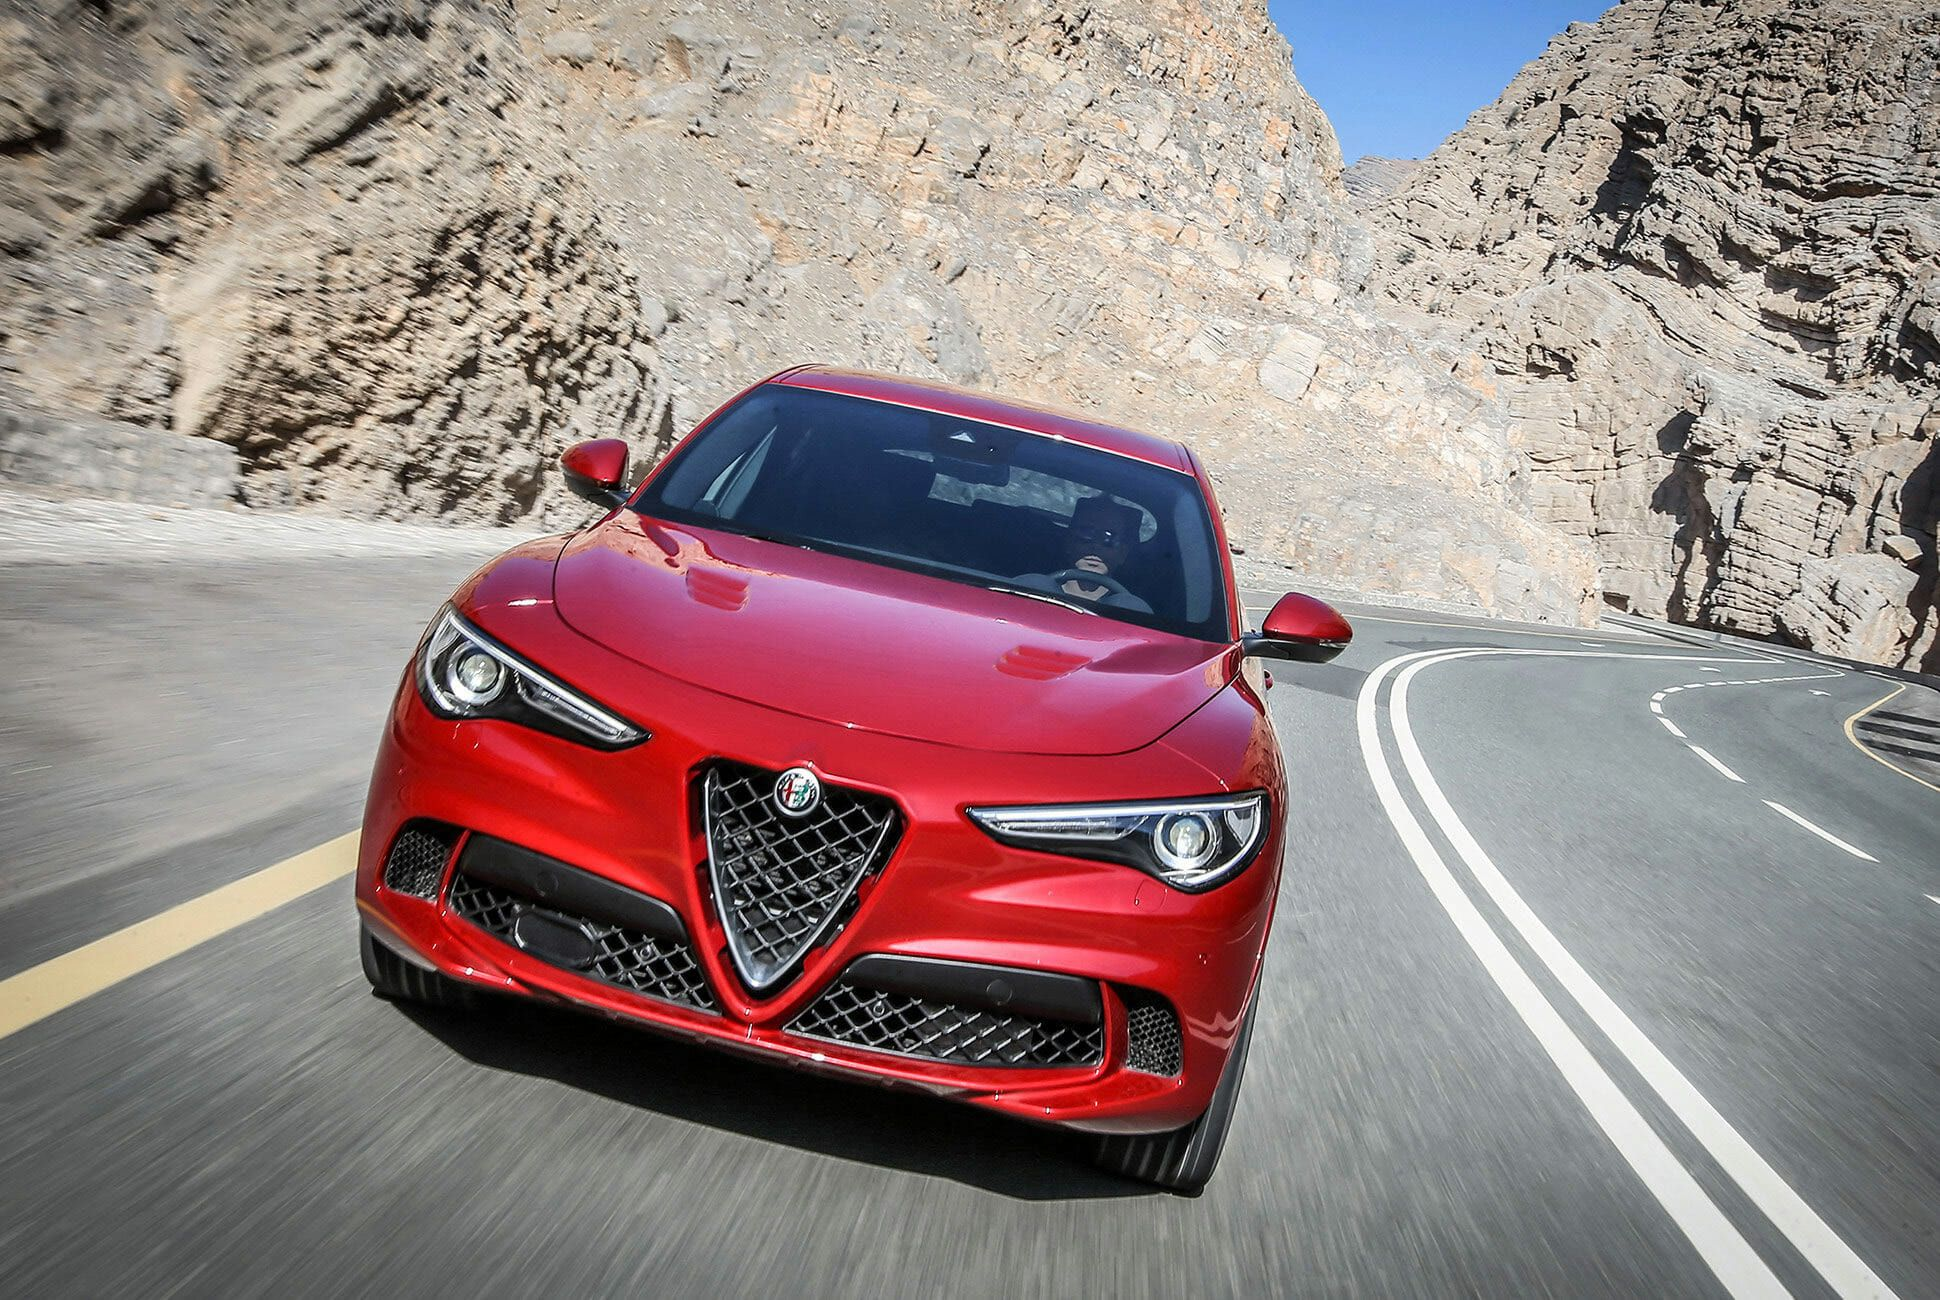 Alfa-Romeo-Quadrifoglio-Stelvia-and-Giulia-gear-patrol-slide-10